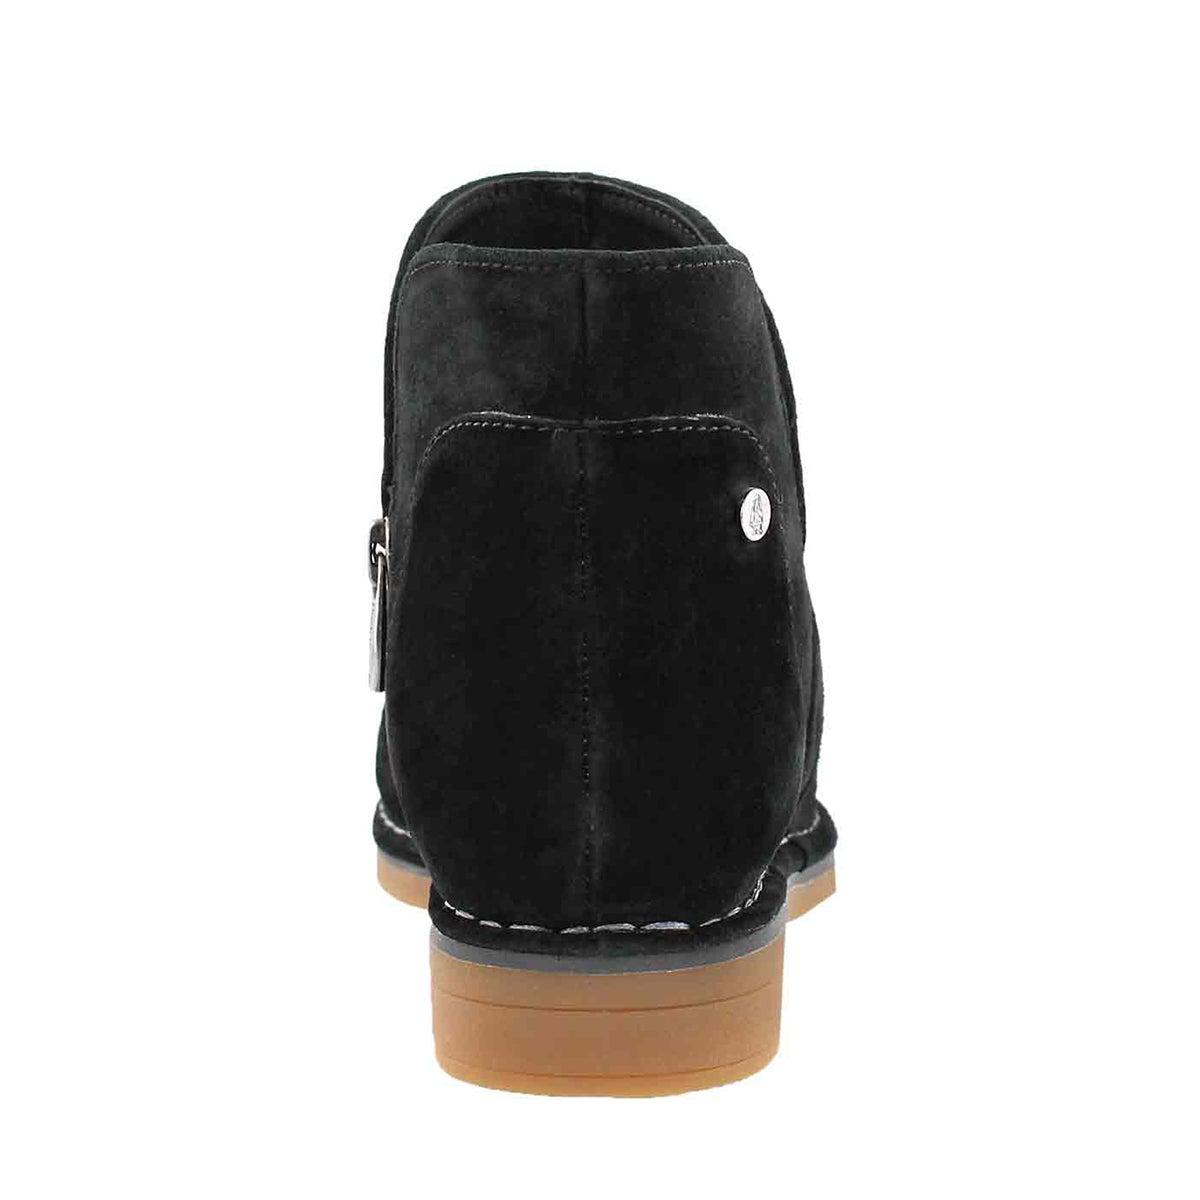 Lds Claudia Catelyn black slip on boot